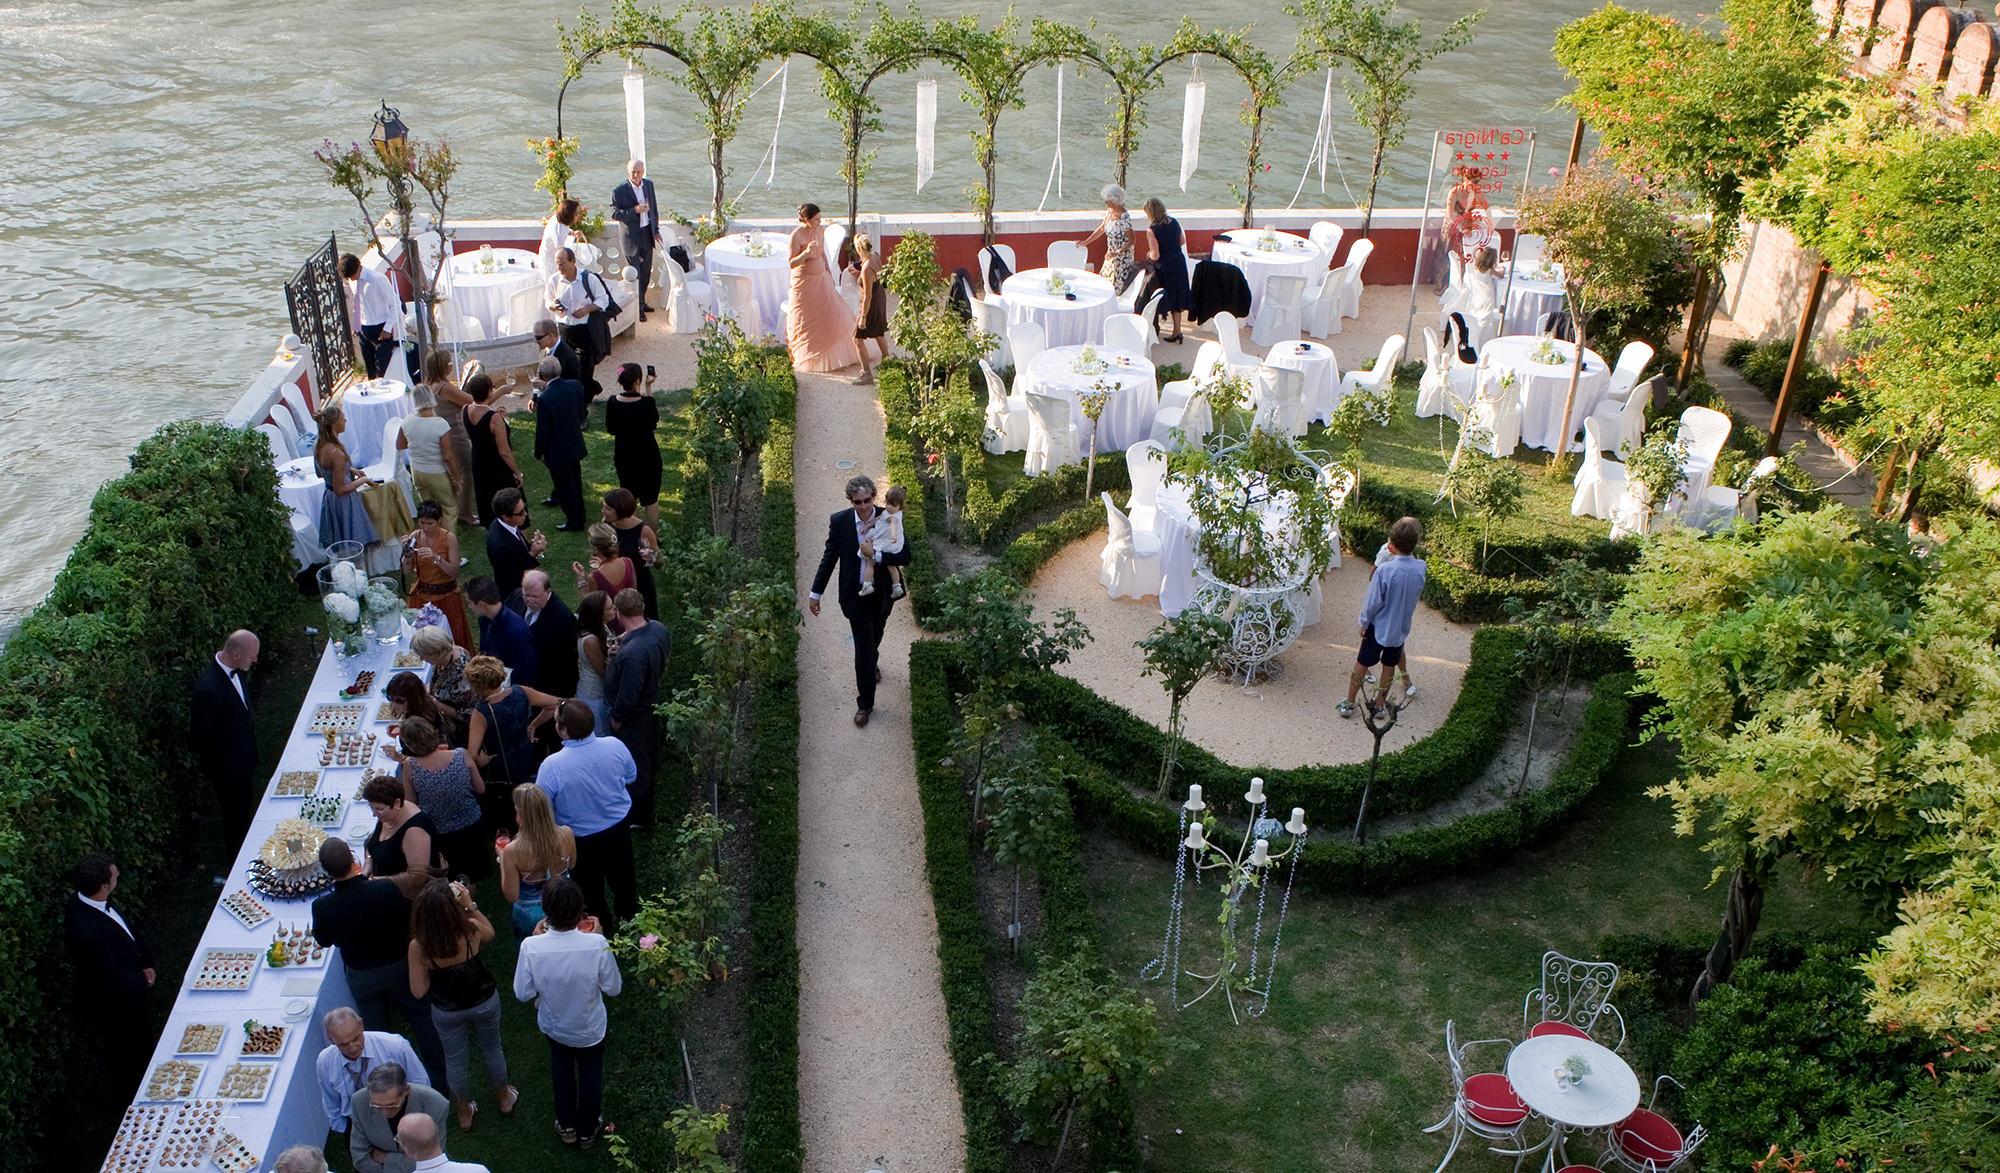 Design hotel venice italy wedding locations for Design hotel wedding